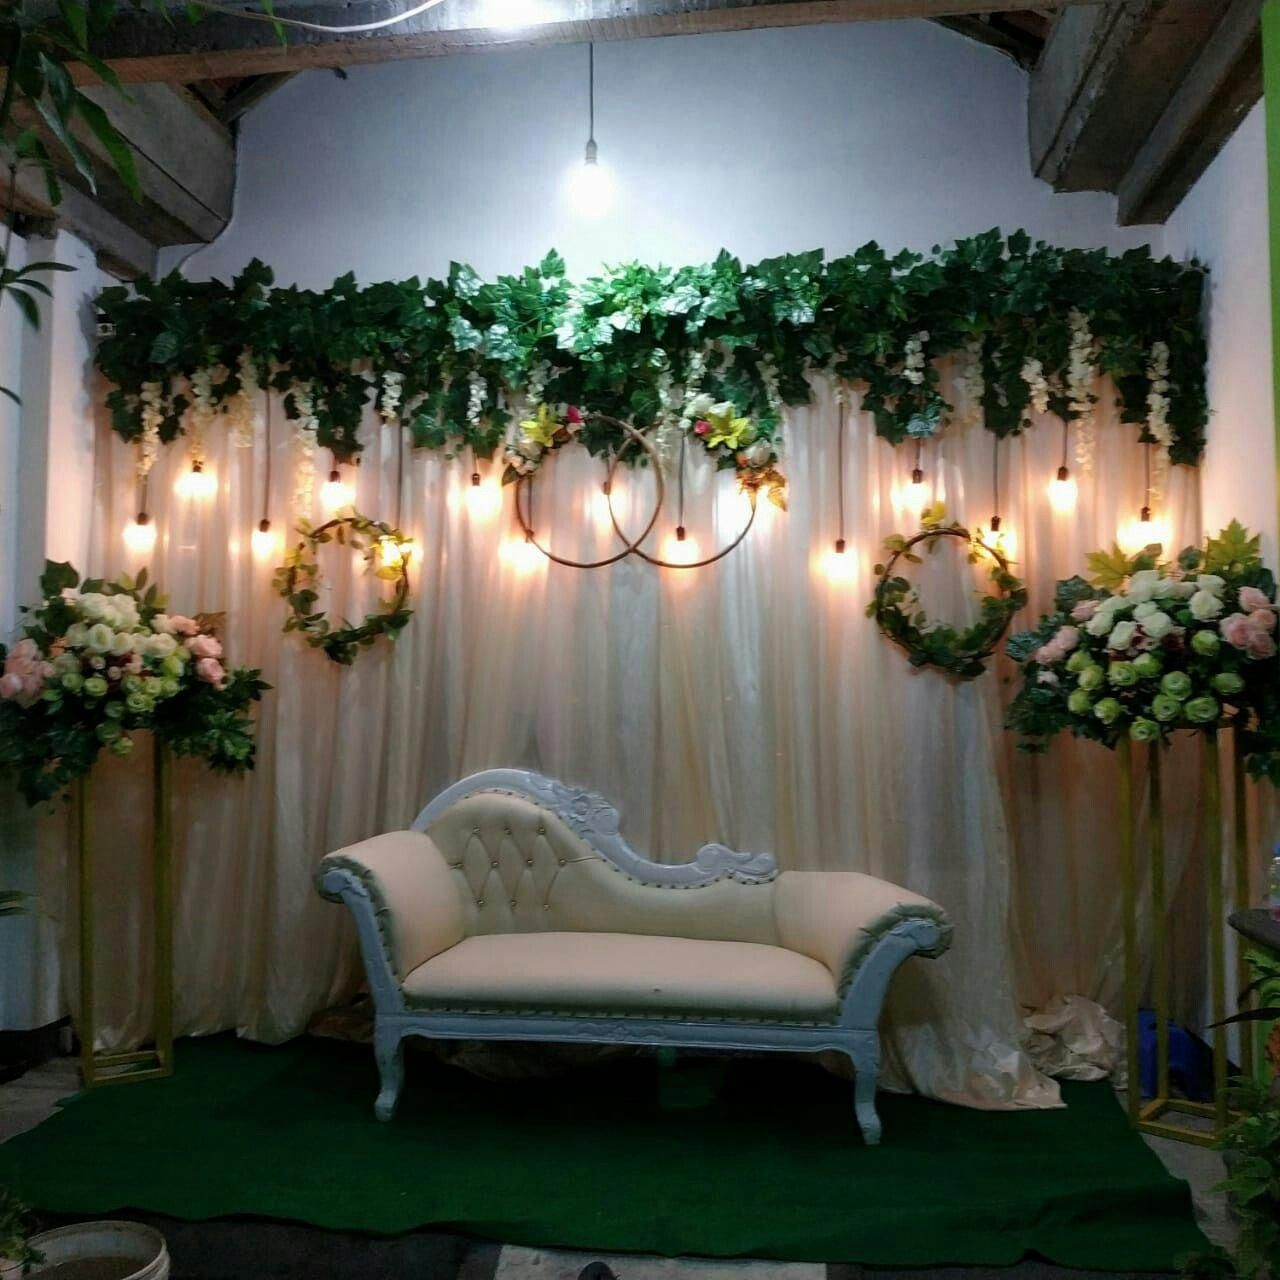 A Must Try Rustic Chic Wedding Tips So Kindly Get These Simple Eye Pleasing Wedding Inspiration Pi Tempat Pernikahan Latar Belakang Pernikahan Ide Perkawinan